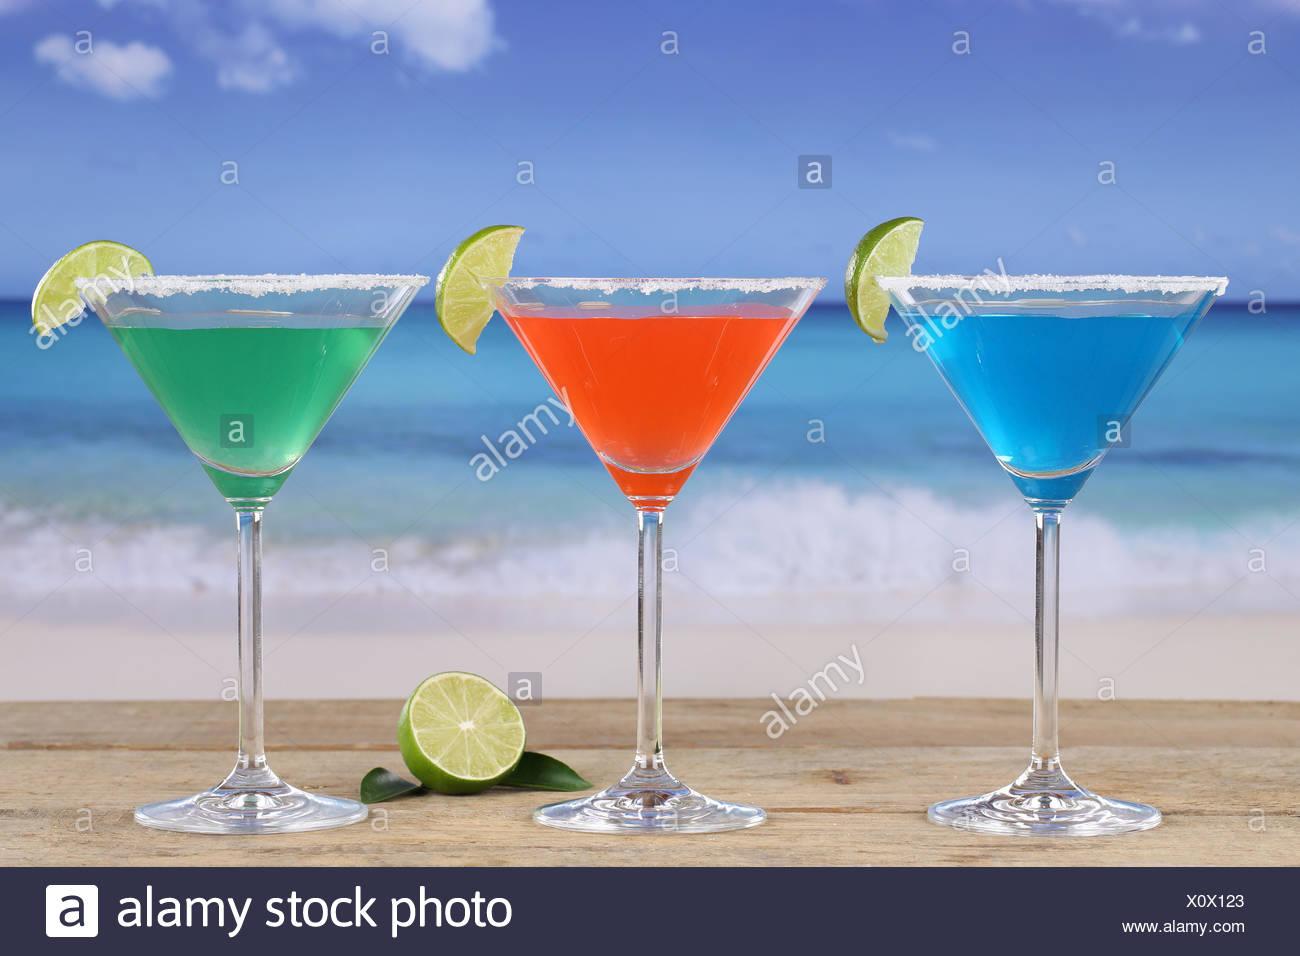 Martini Cocktails am Strand im Urlaub - Stock Image